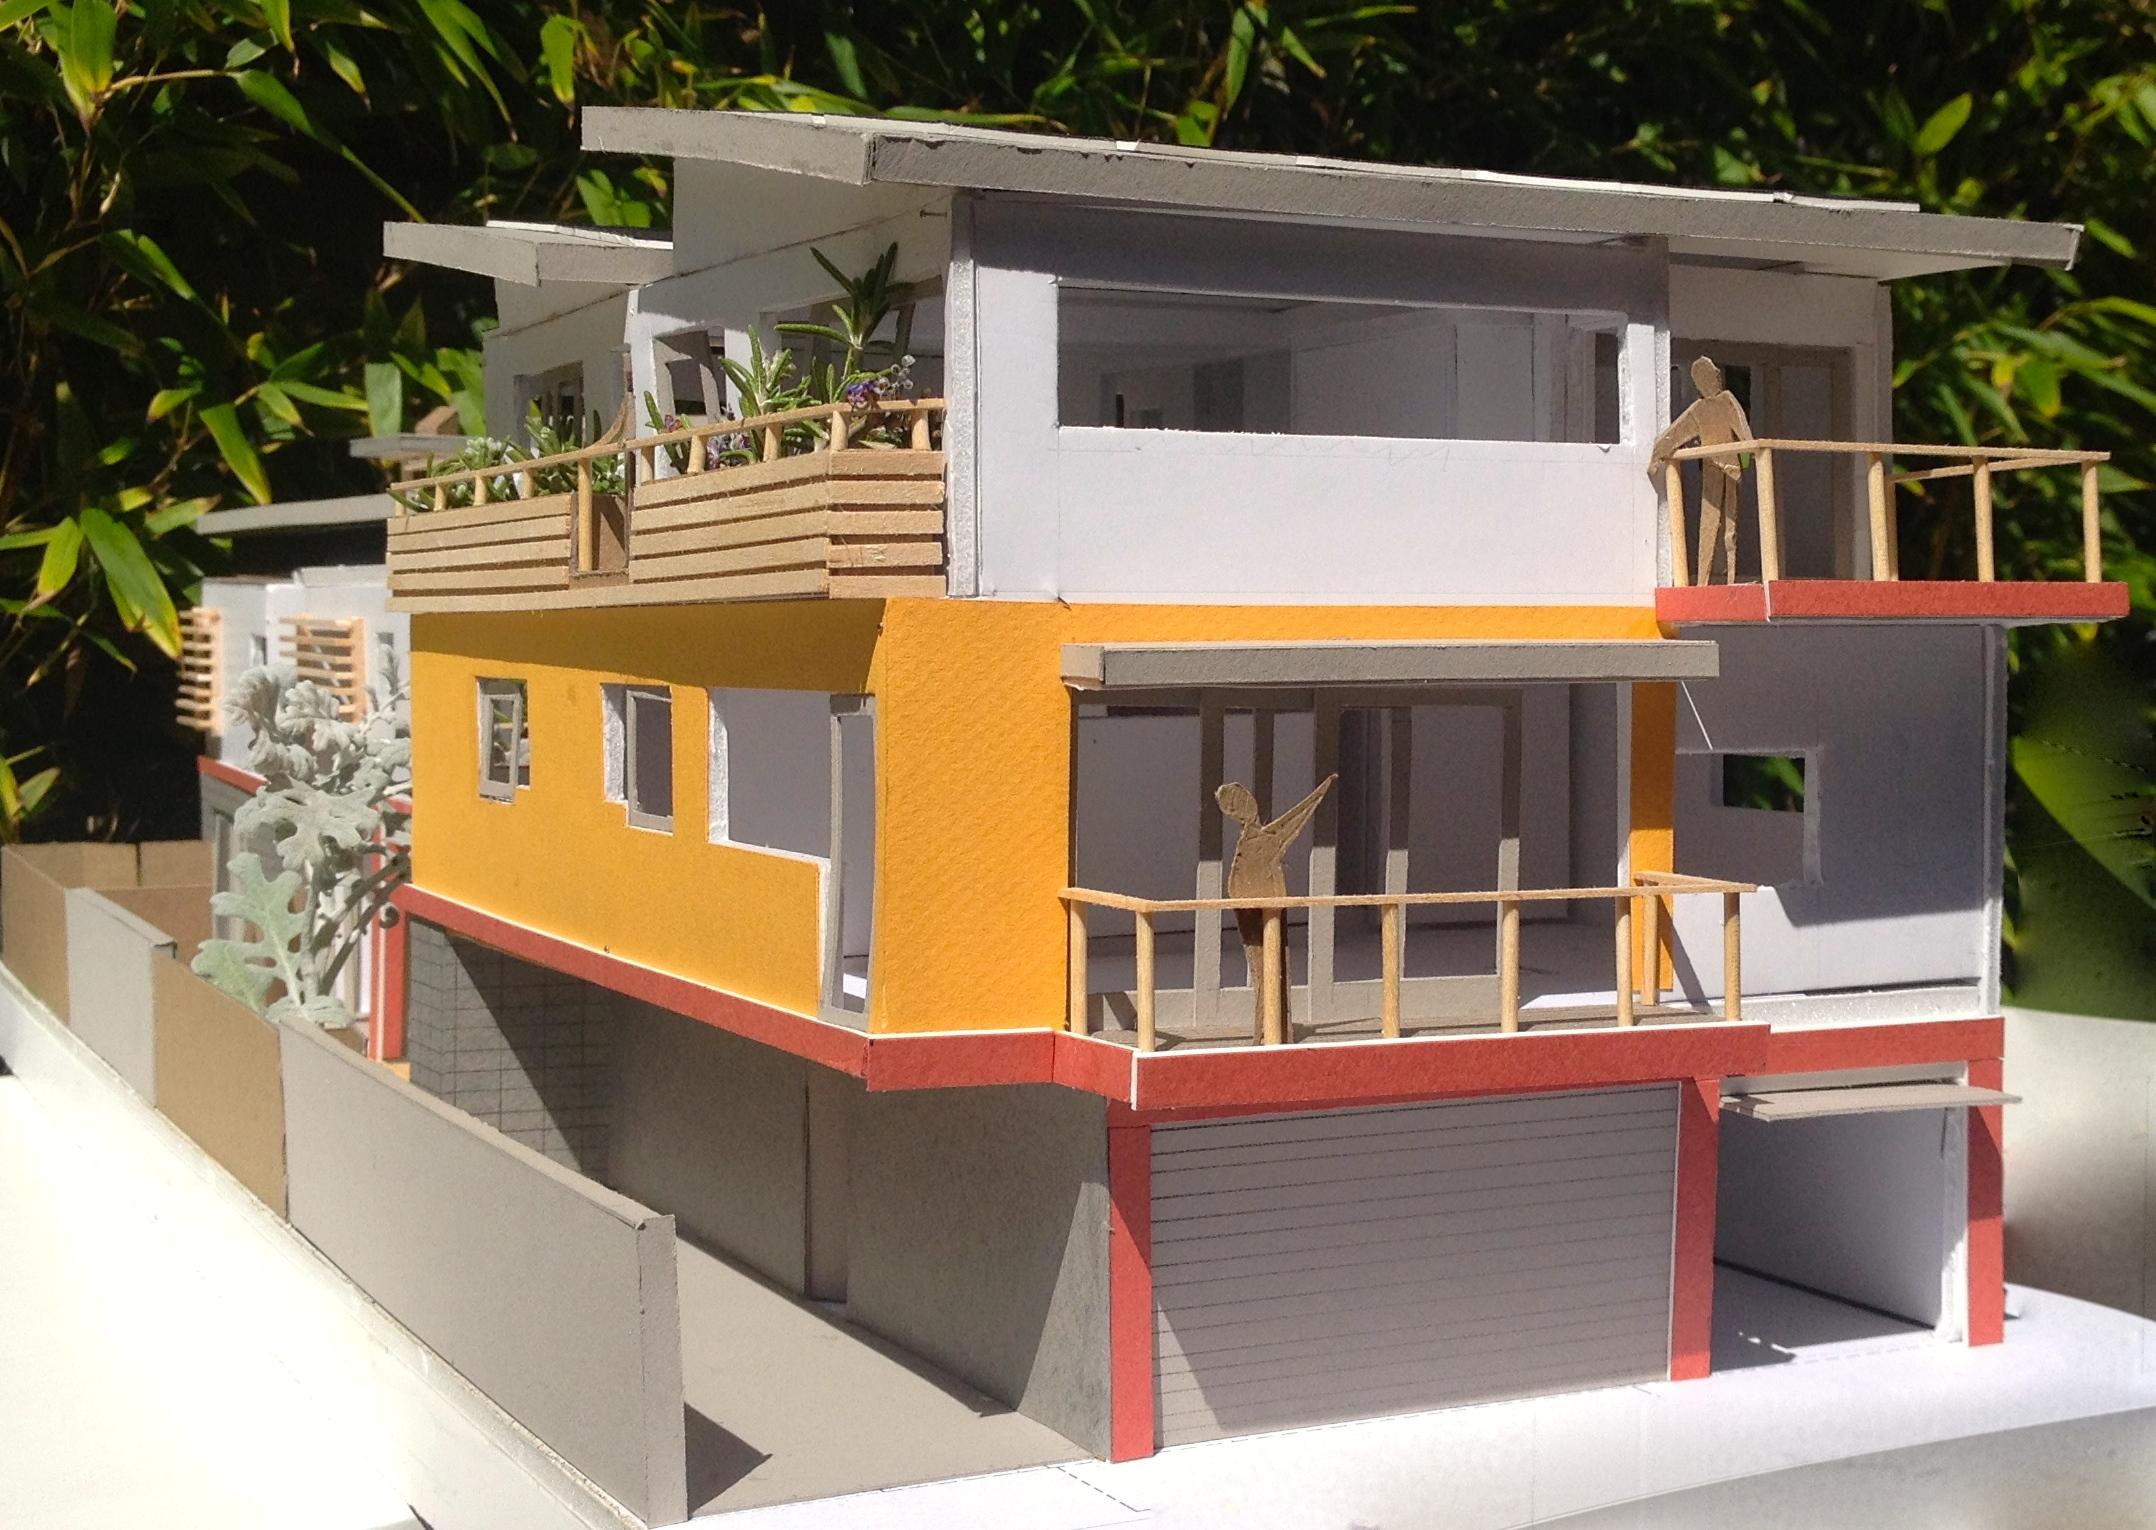 Second unit balconies & alley parking